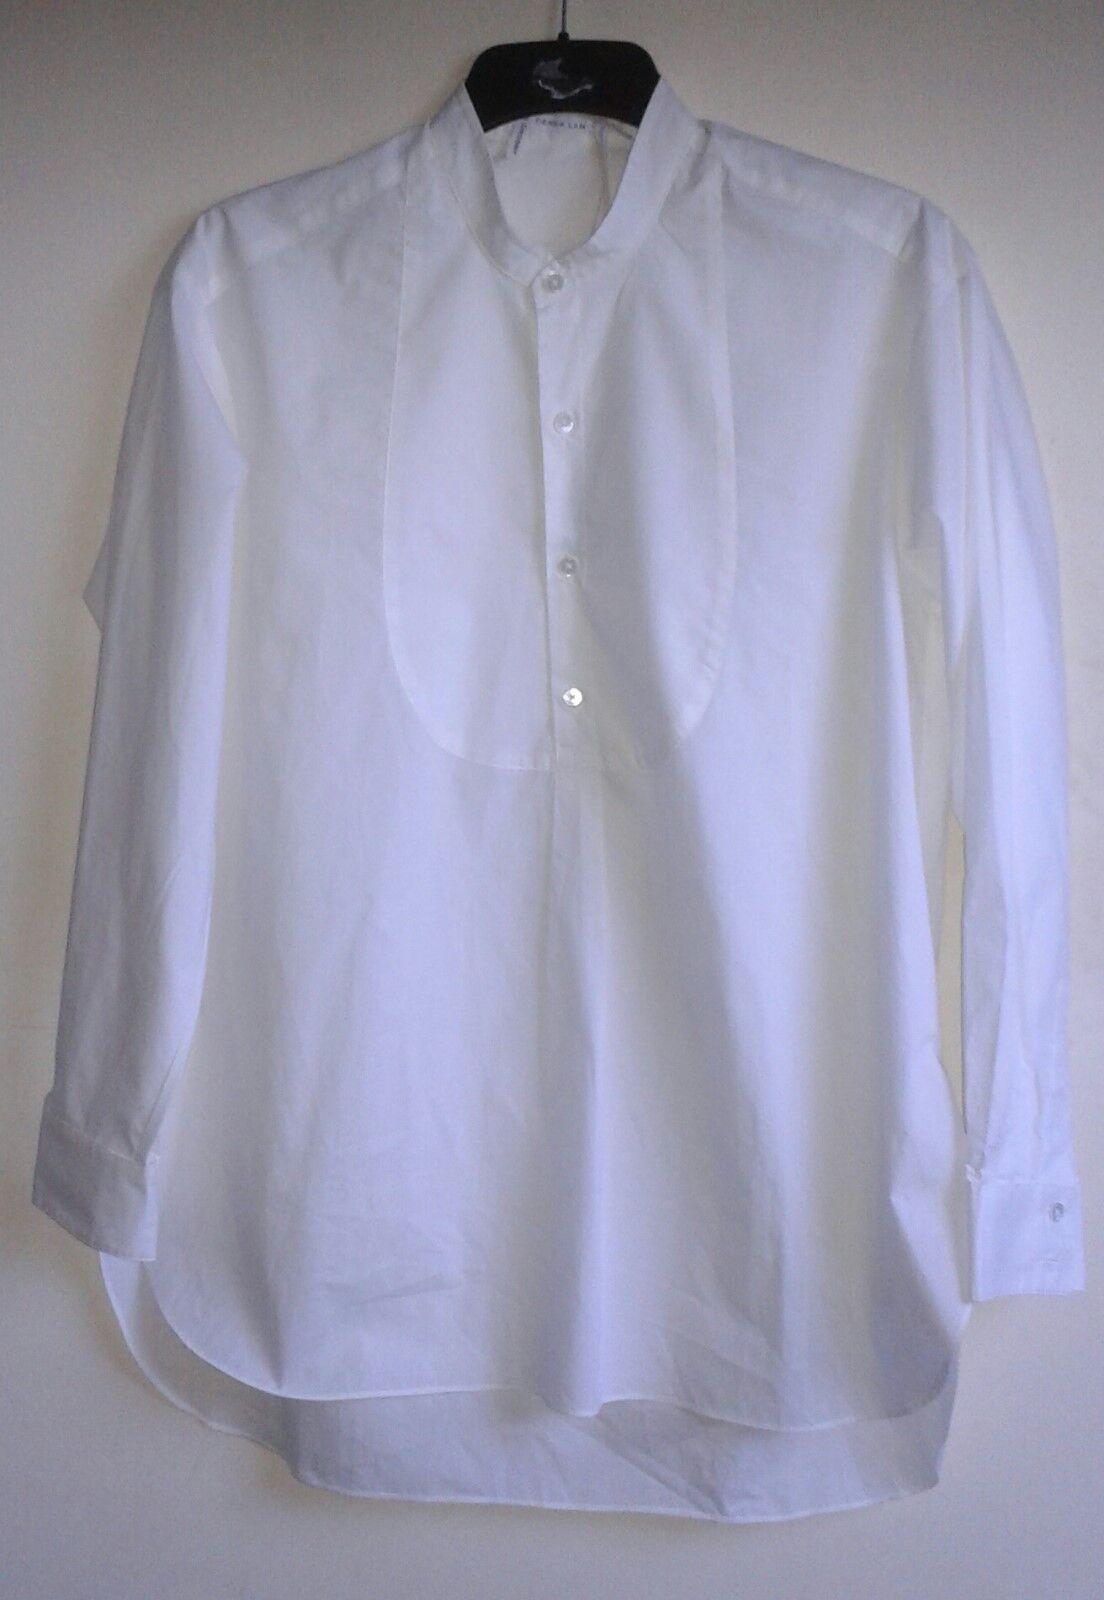 10 Crosby Derek Lam White Long Sleeve Tuxedo Shirt - XL